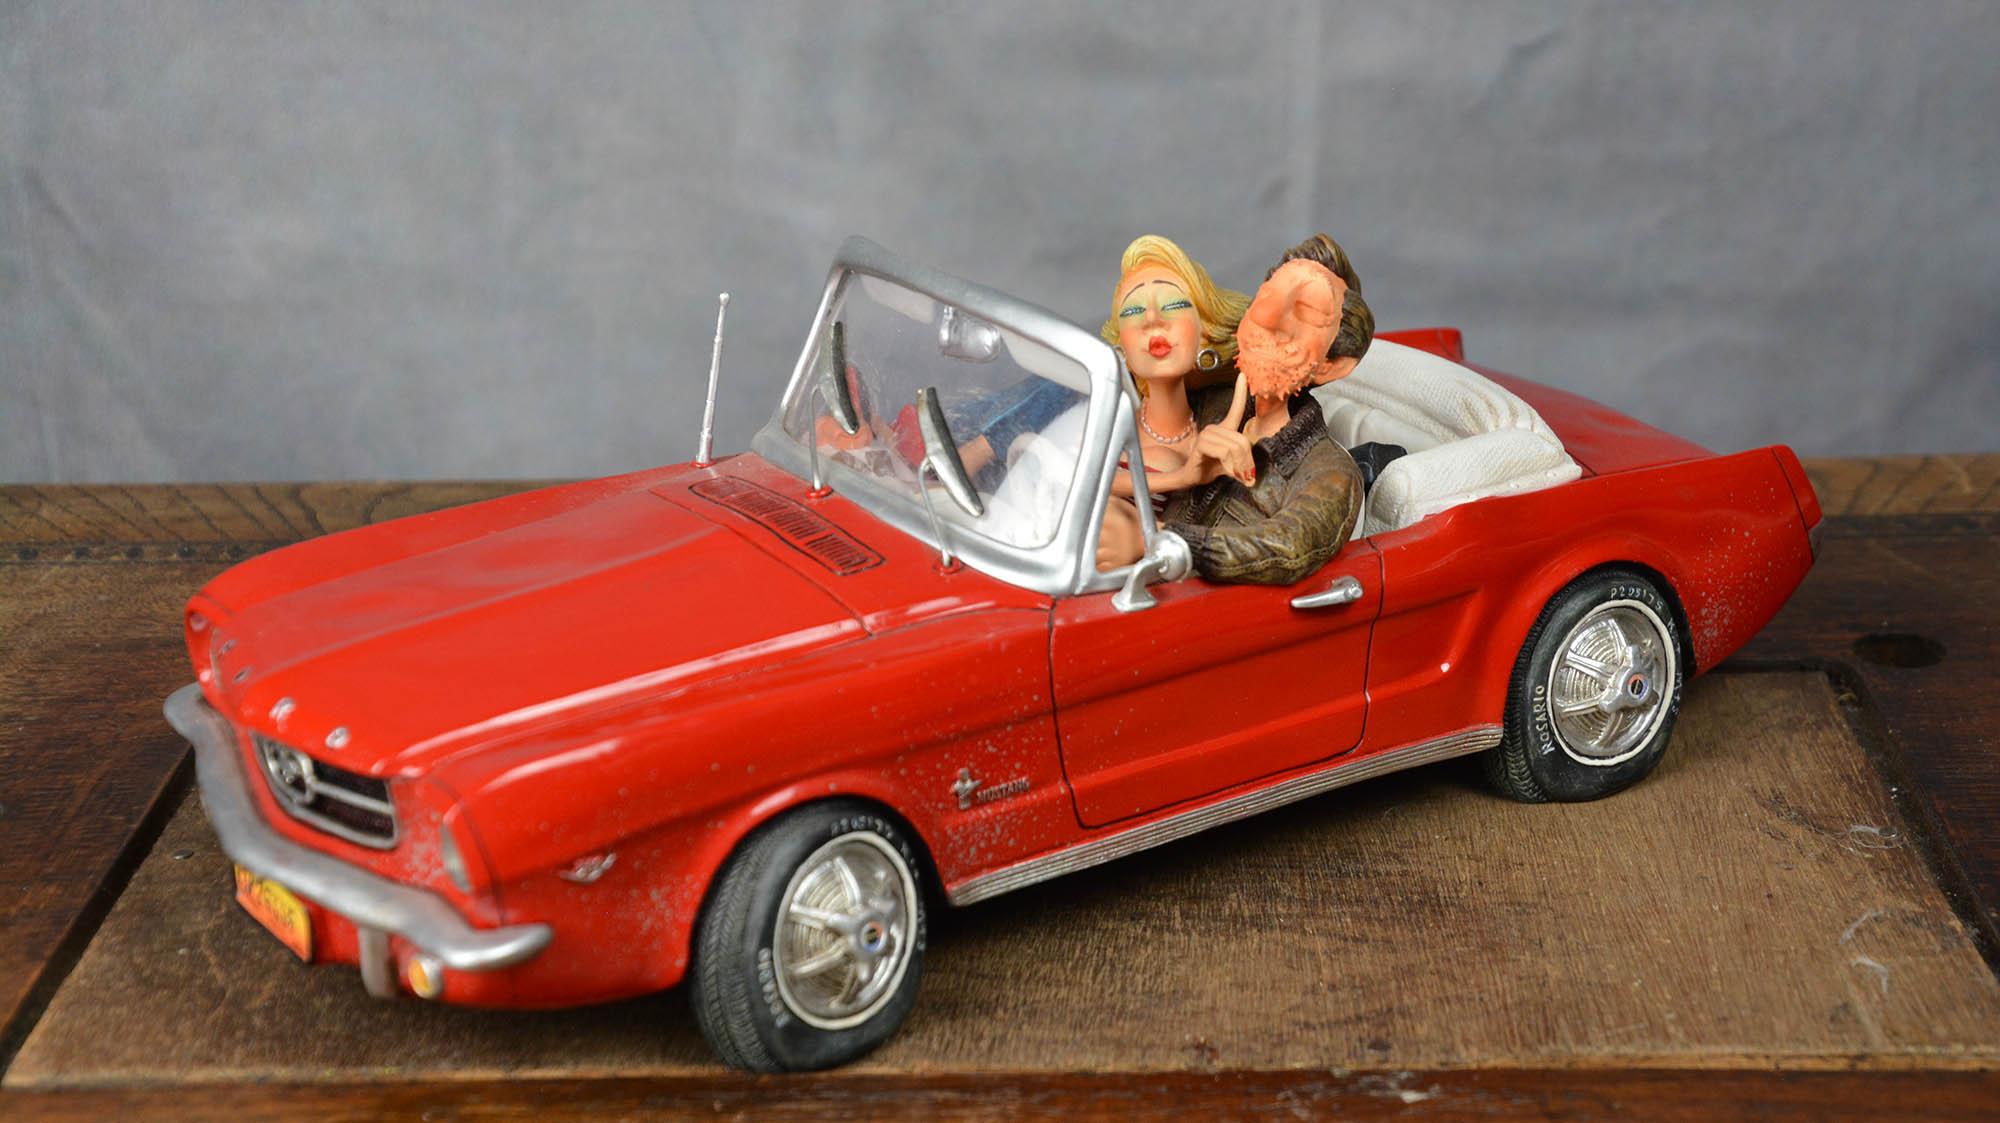 boutique figurine piece artisanale vehicule ford parodie